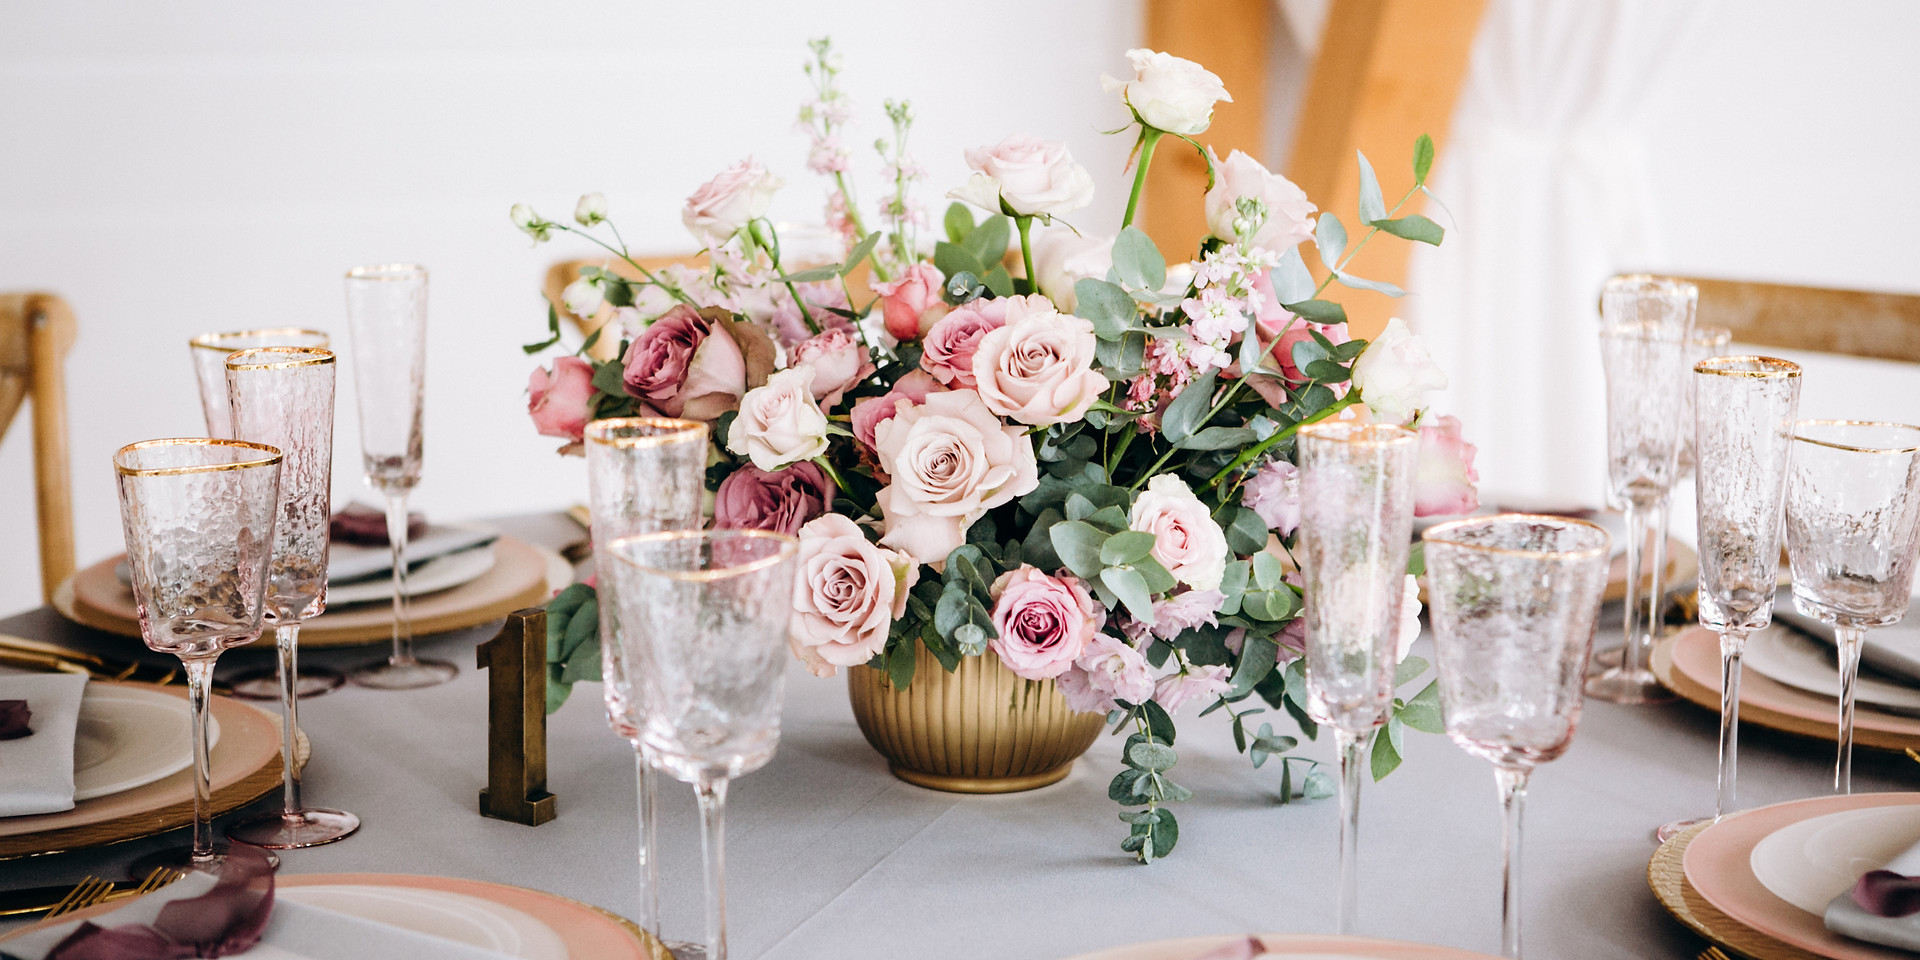 Amazing wedding table decoration with fl